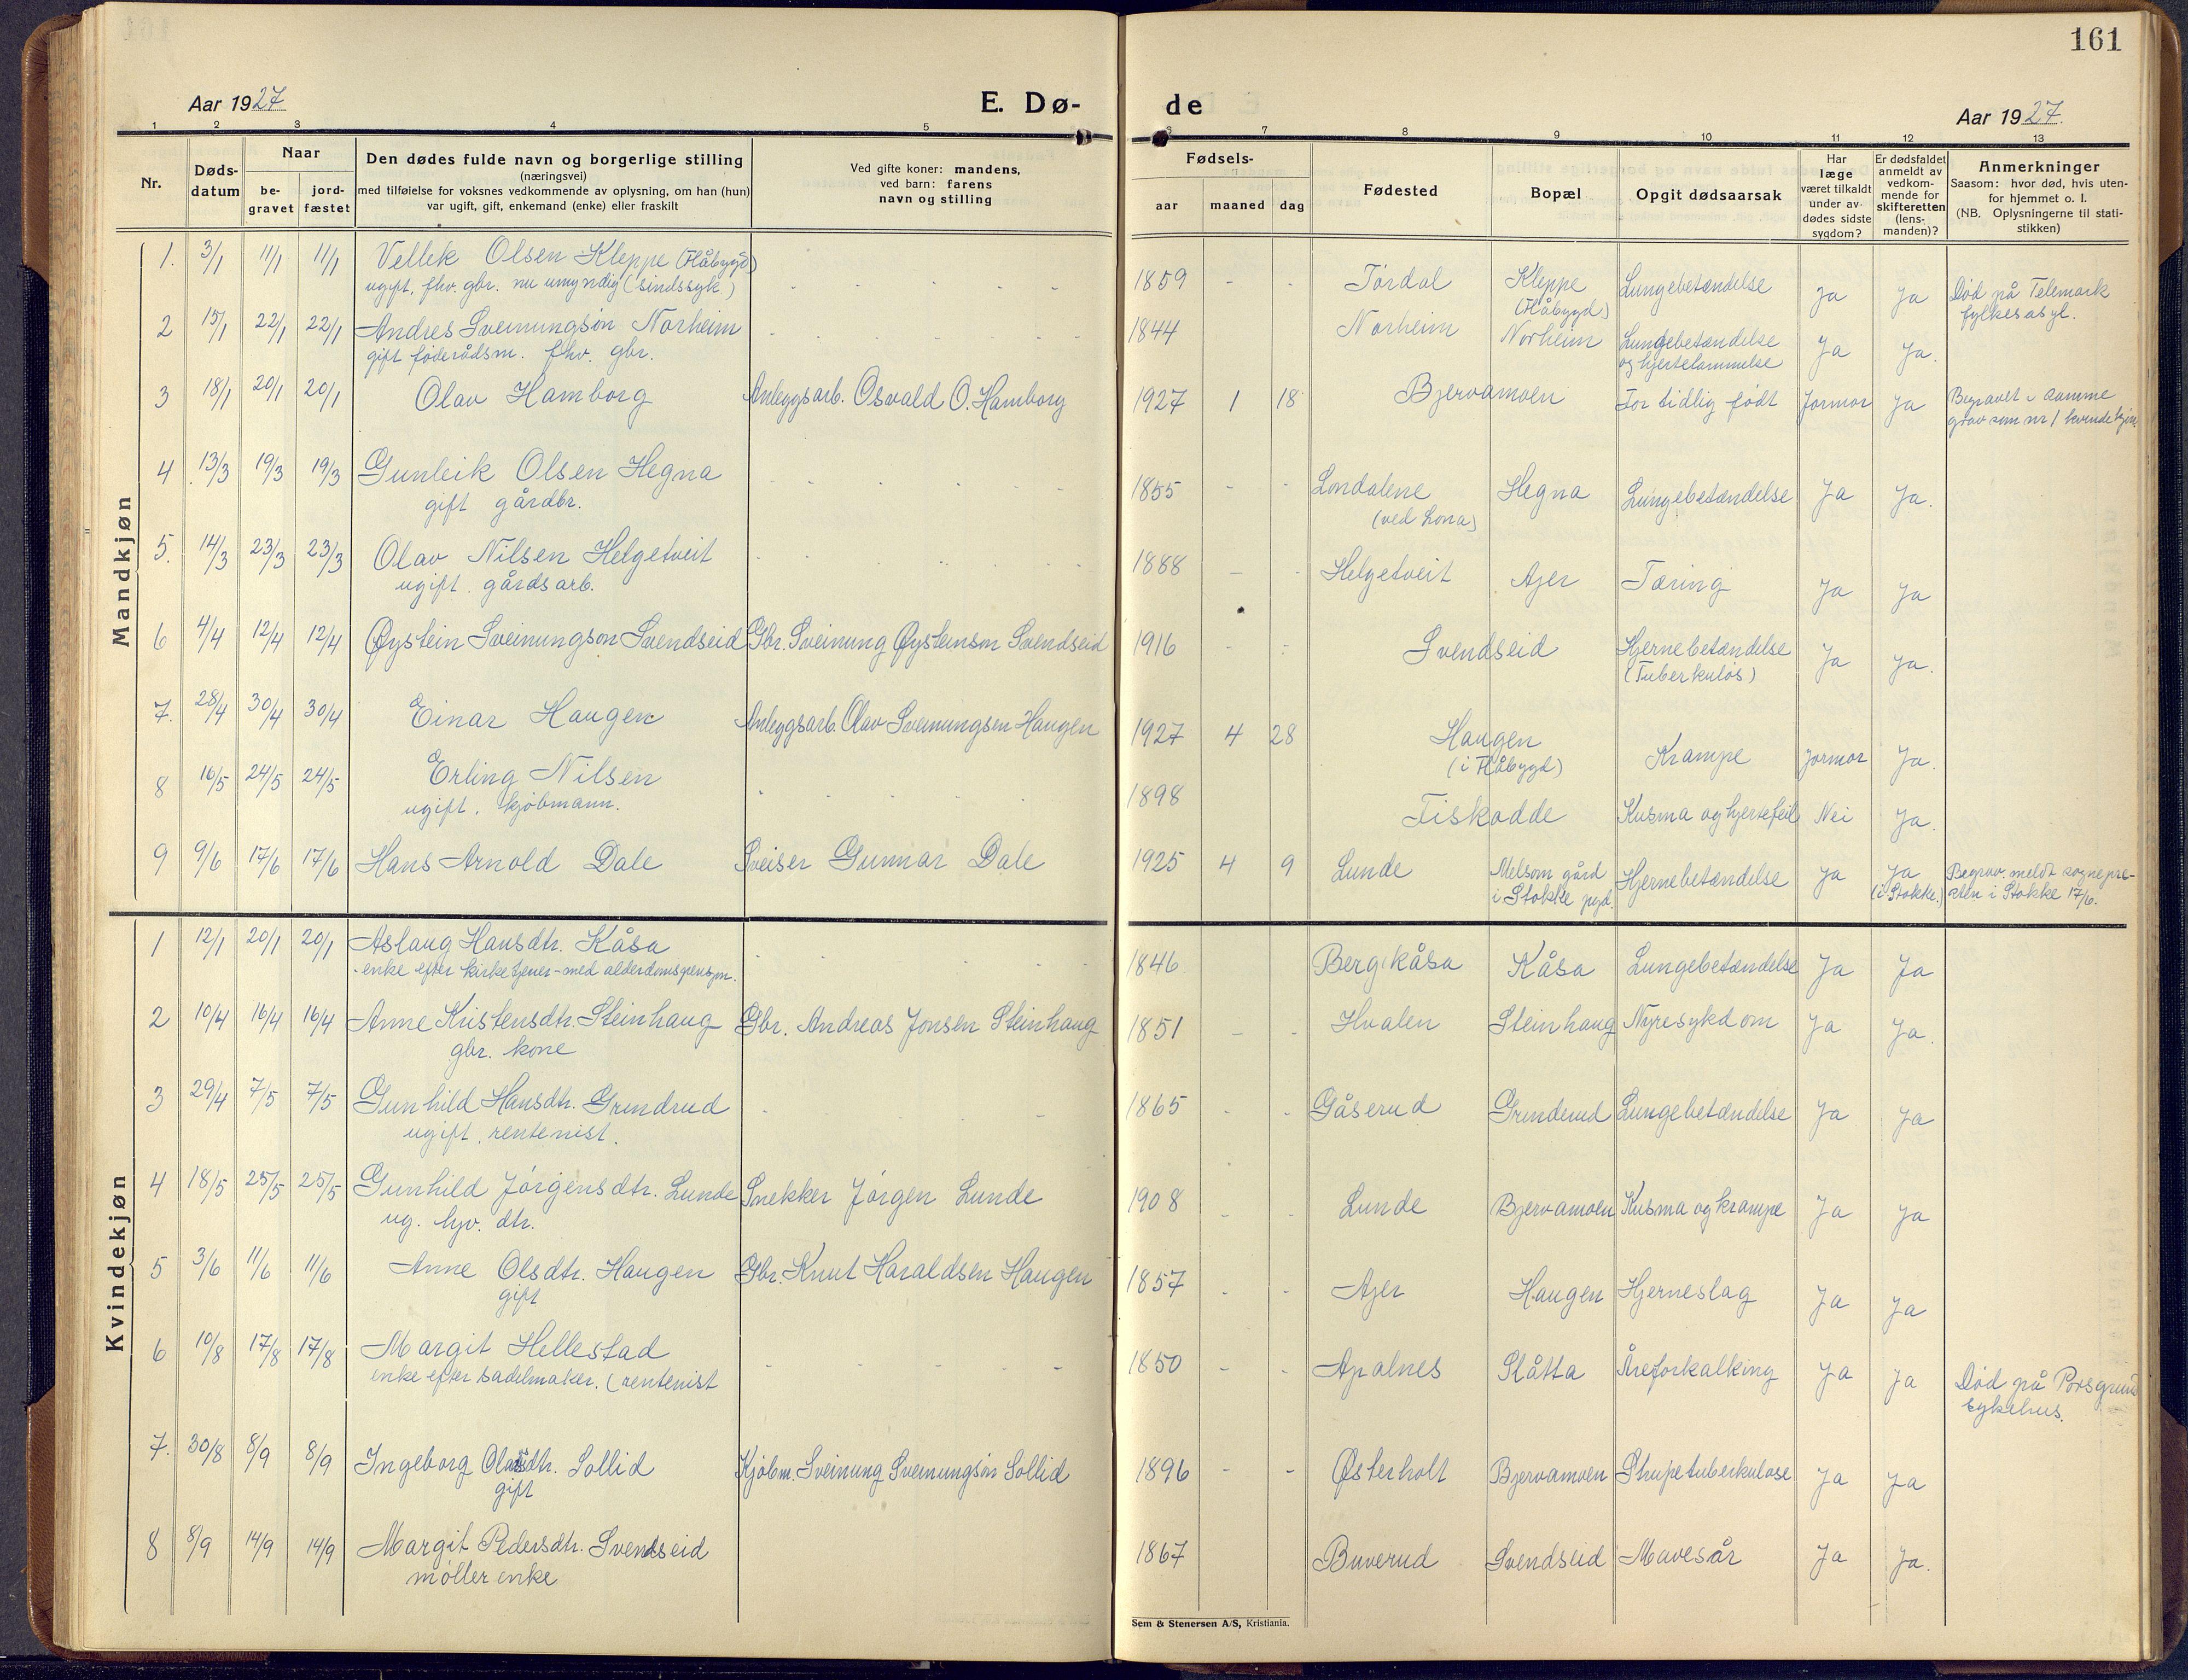 SAKO, Lunde kirkebøker, F/Fa/L0006: Ministerialbok nr. I 6, 1922-1940, s. 161